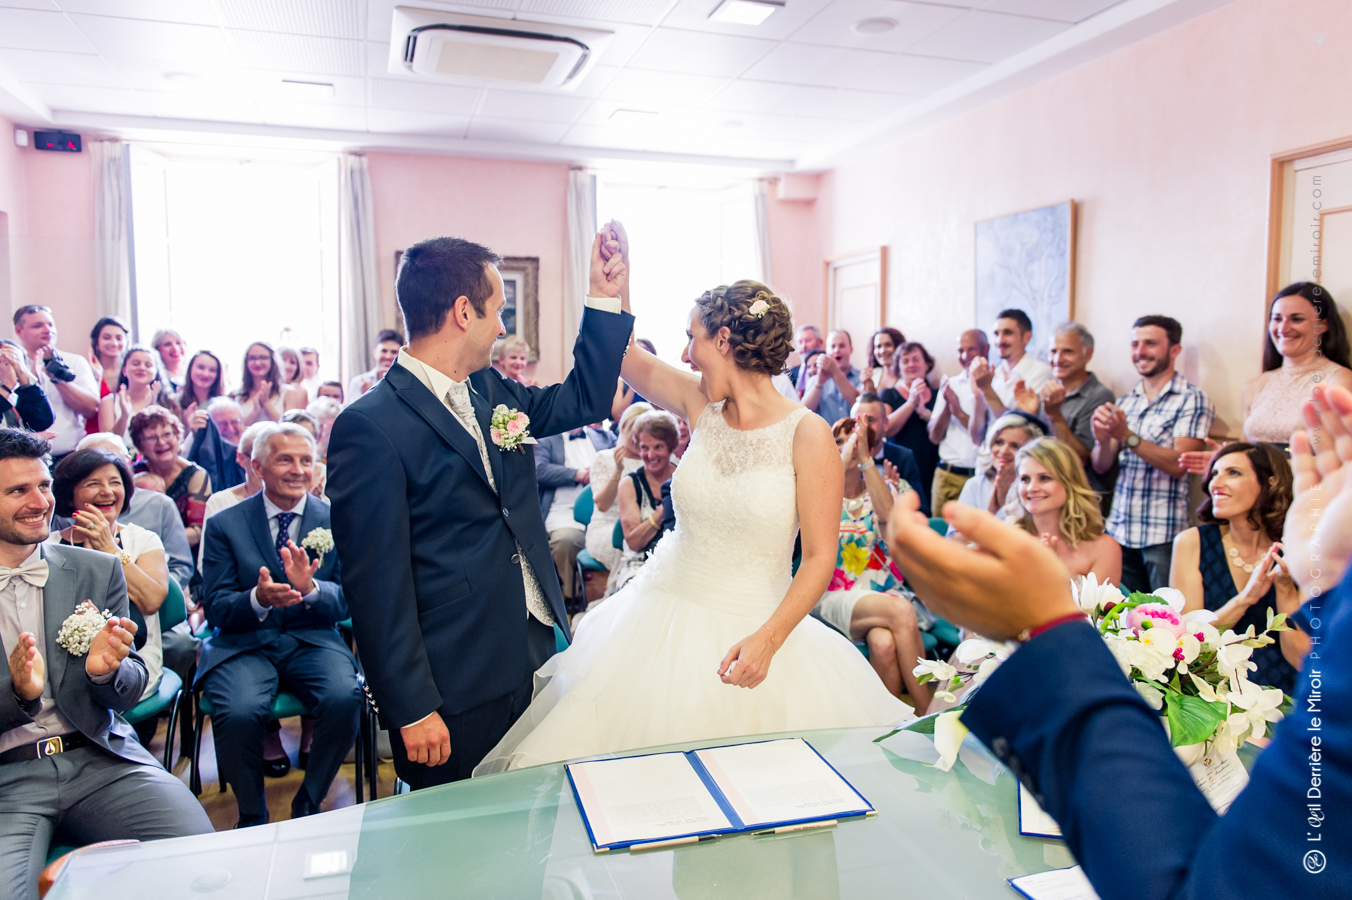 mariage-cj-vaugrenier-loeilderrierelemiroir-030